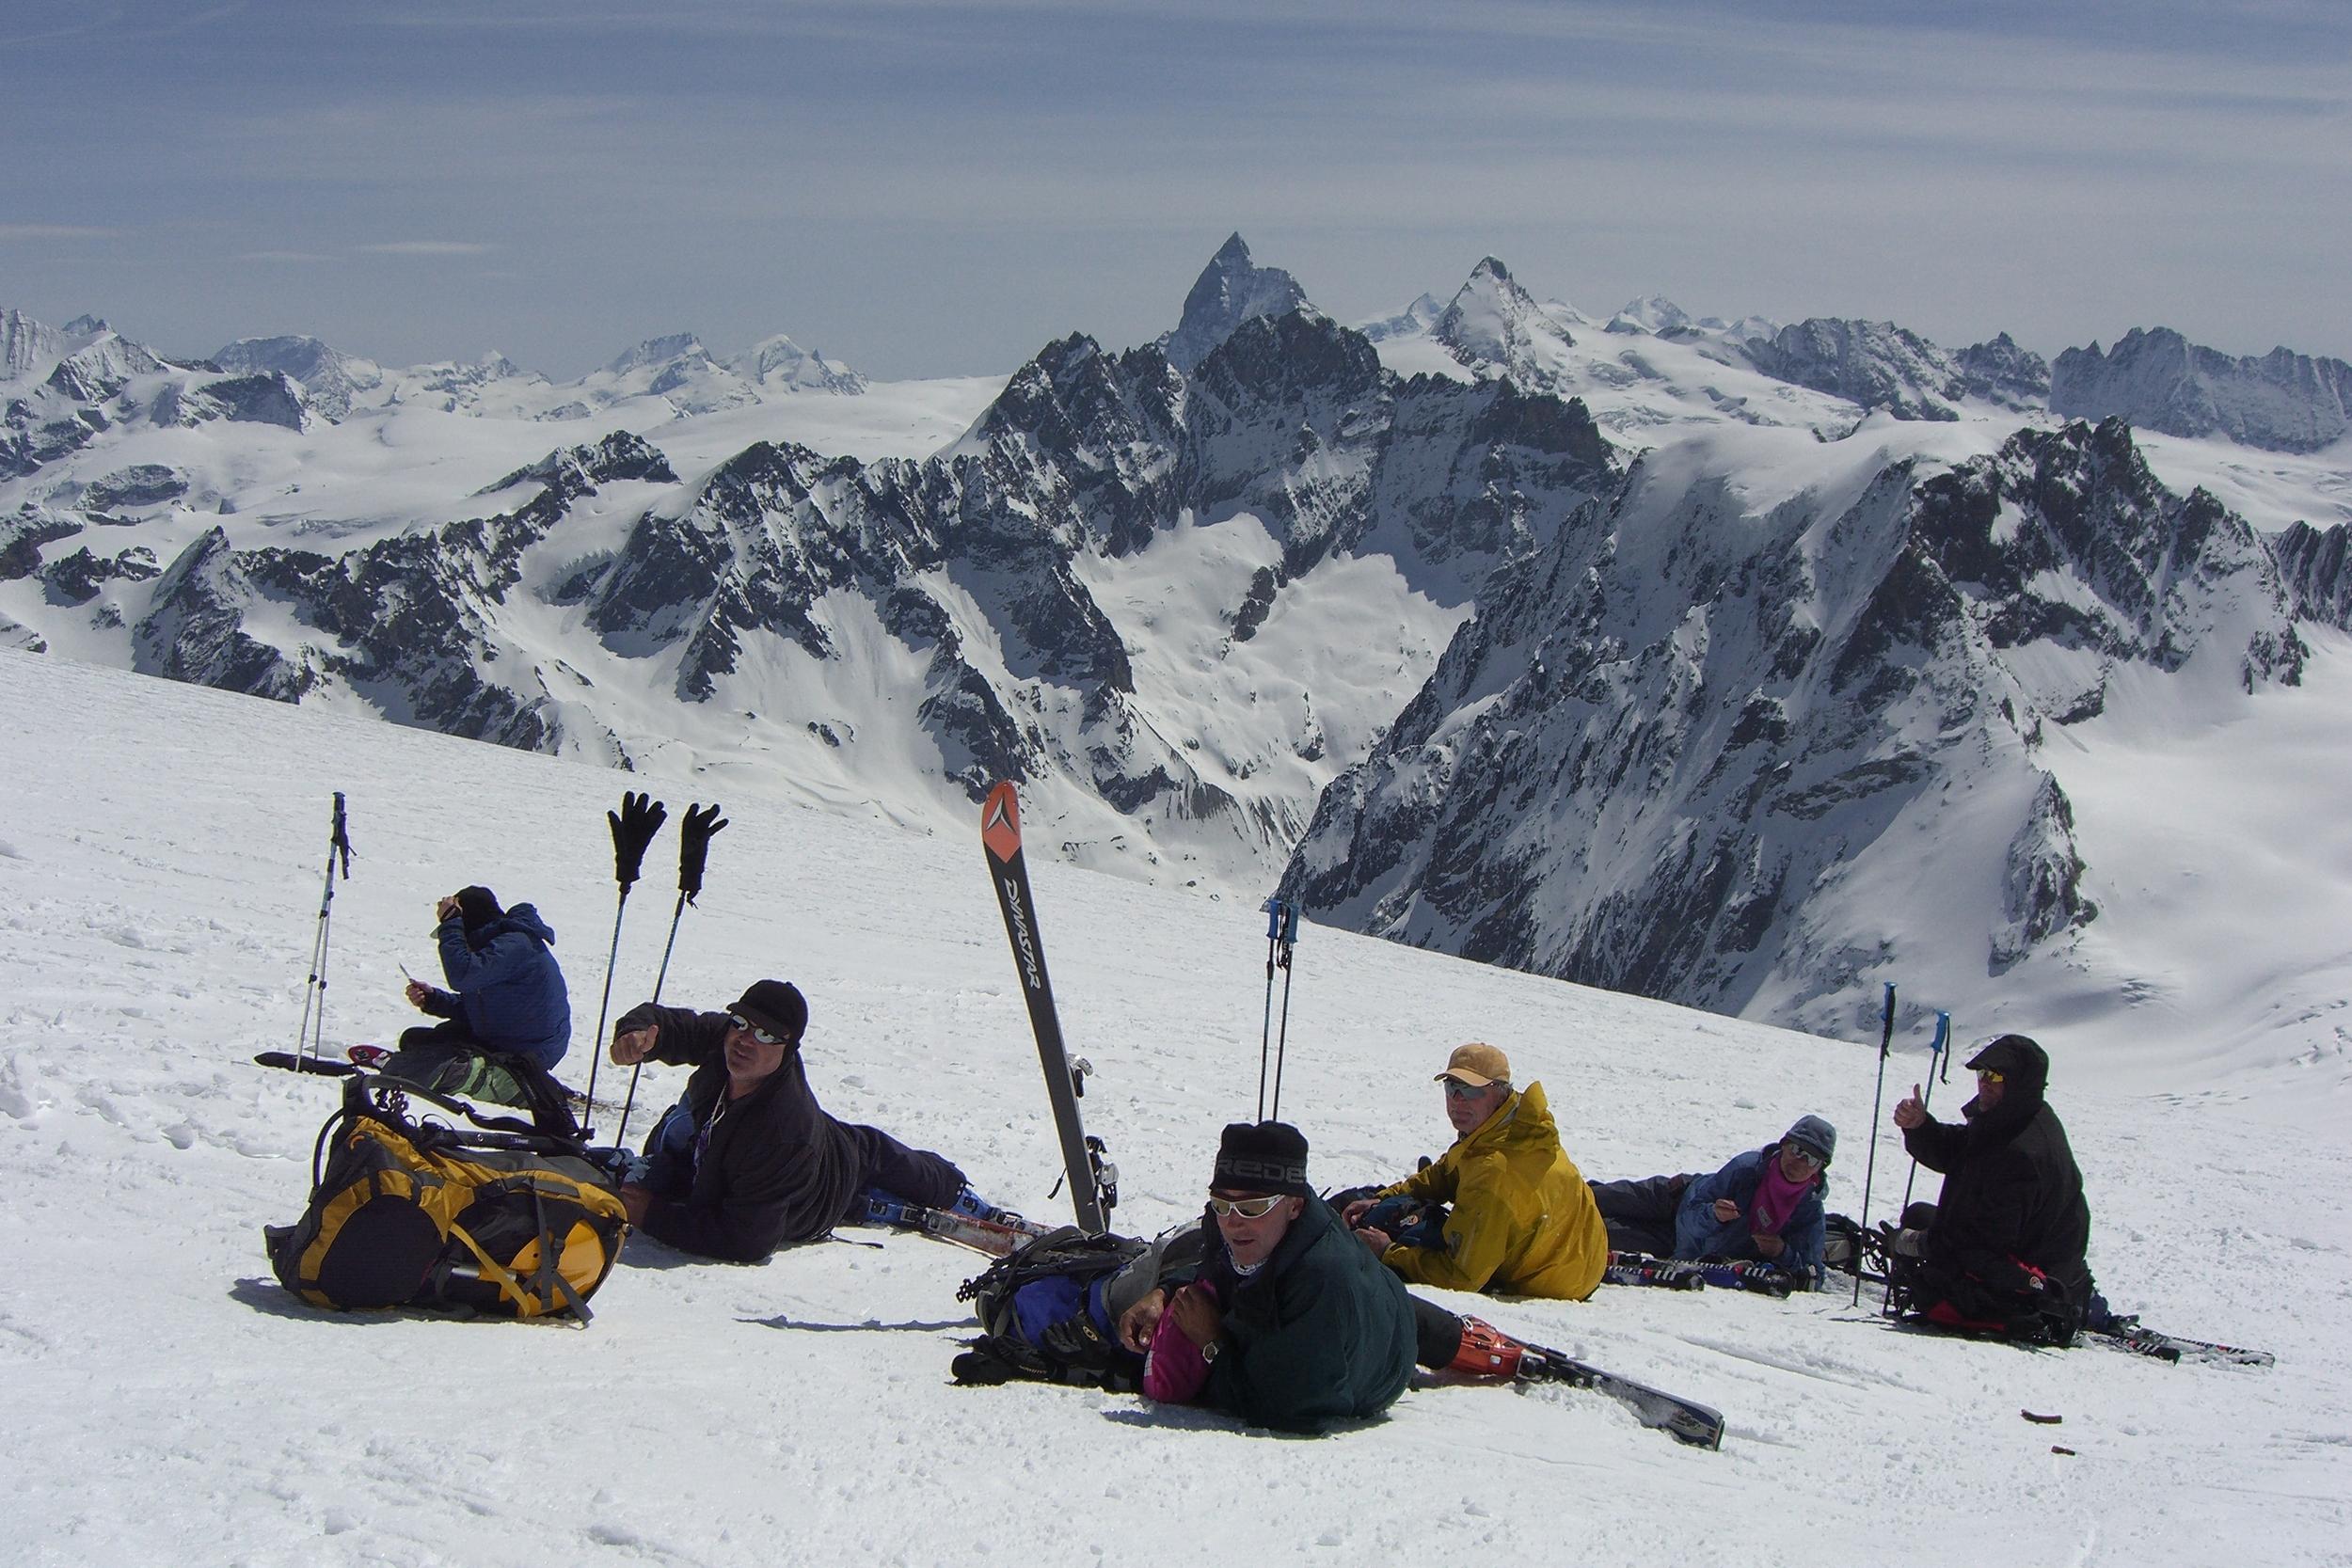 Looking towards the Matterhorn on the last day